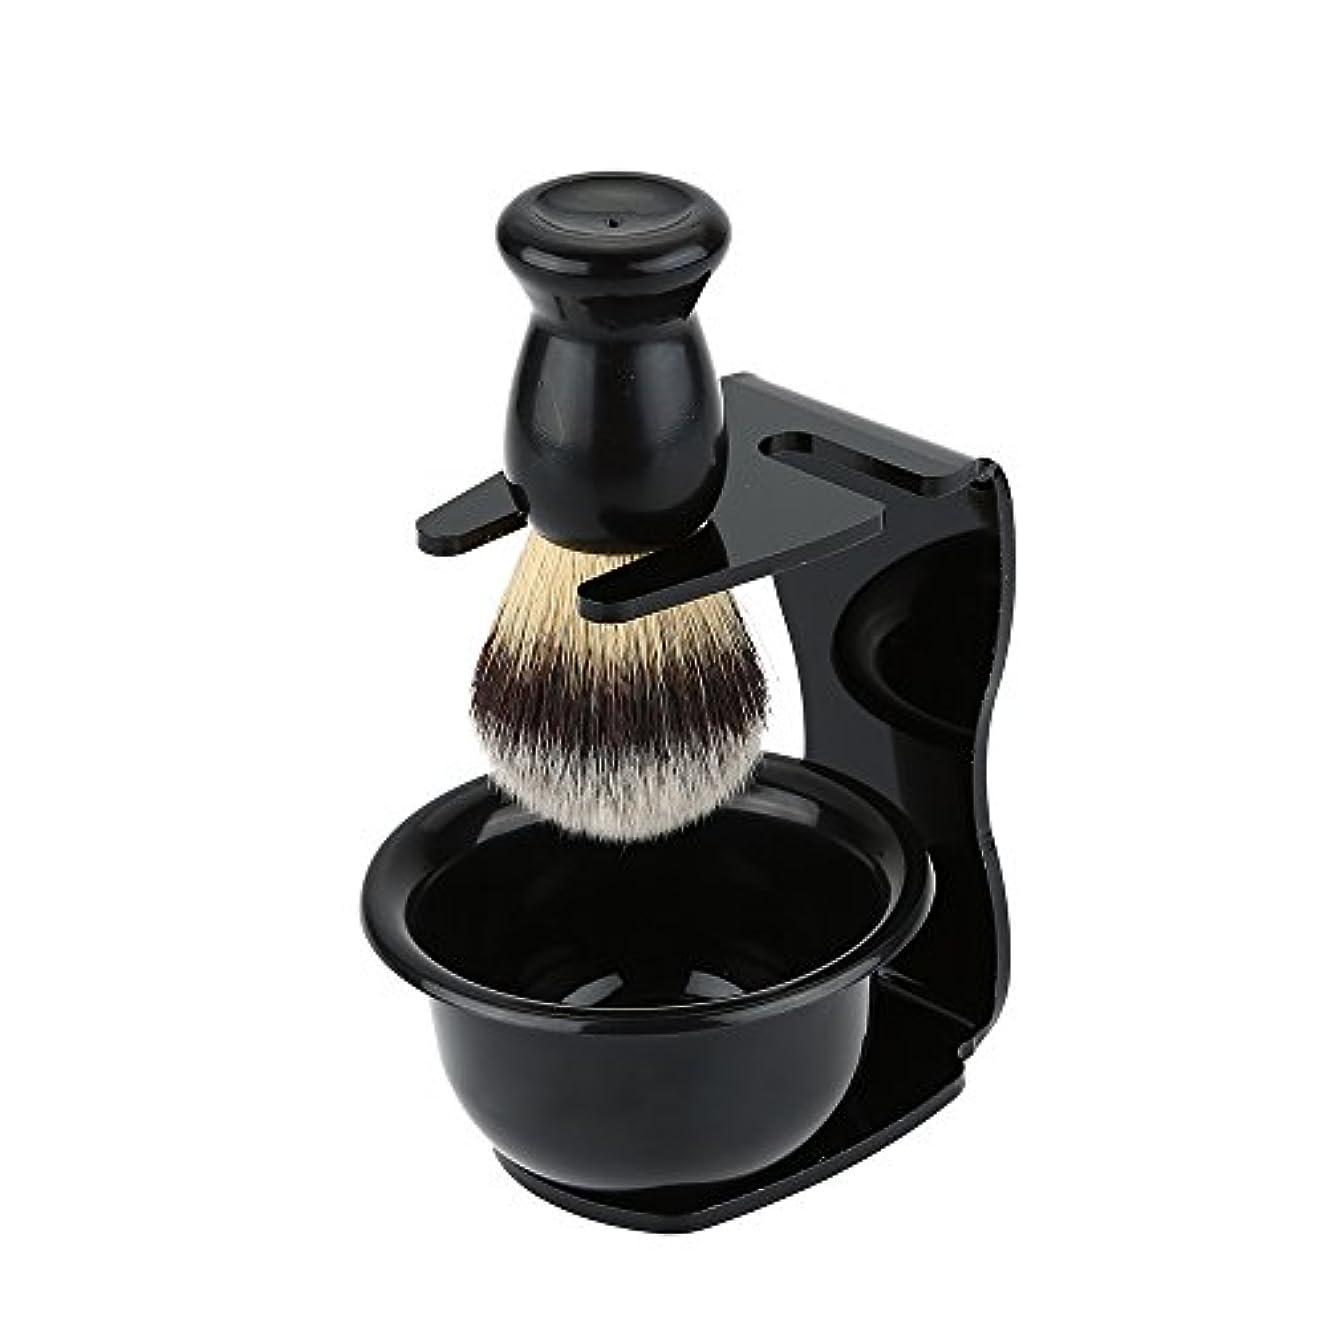 Rakuby 3点セット シェービングブラシキット シェービングブラシ+スタンド+ ソープボウル 洗顔ブラシ 泡立ち 髭剃り 男性用 ダンナ 父親 父の日 プレゼント ブラシアクセサリー